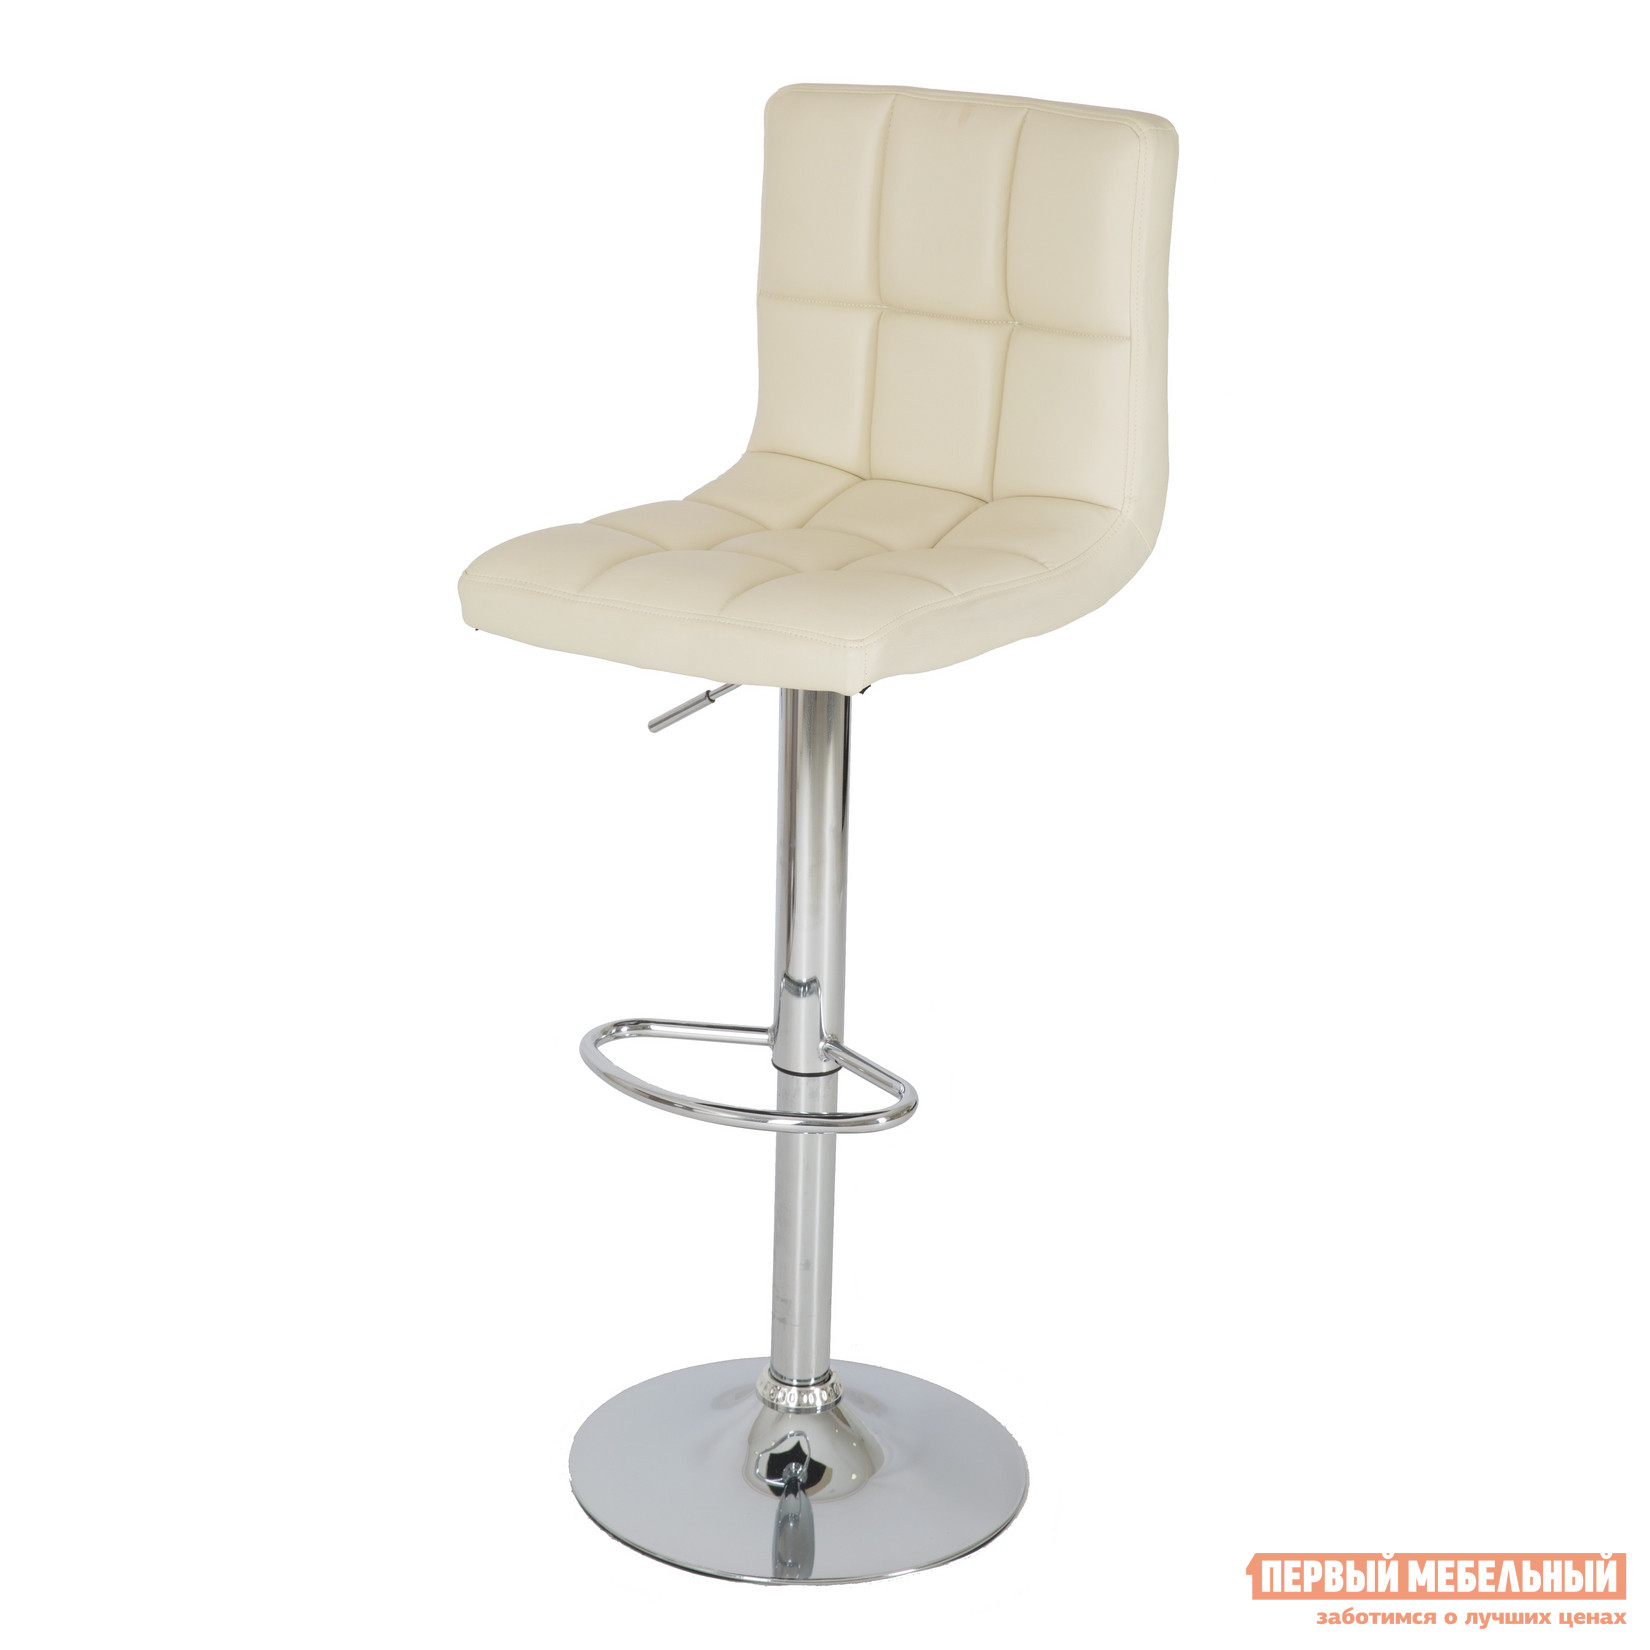 Барный стул Бентли Трейд JY-1005 NEW